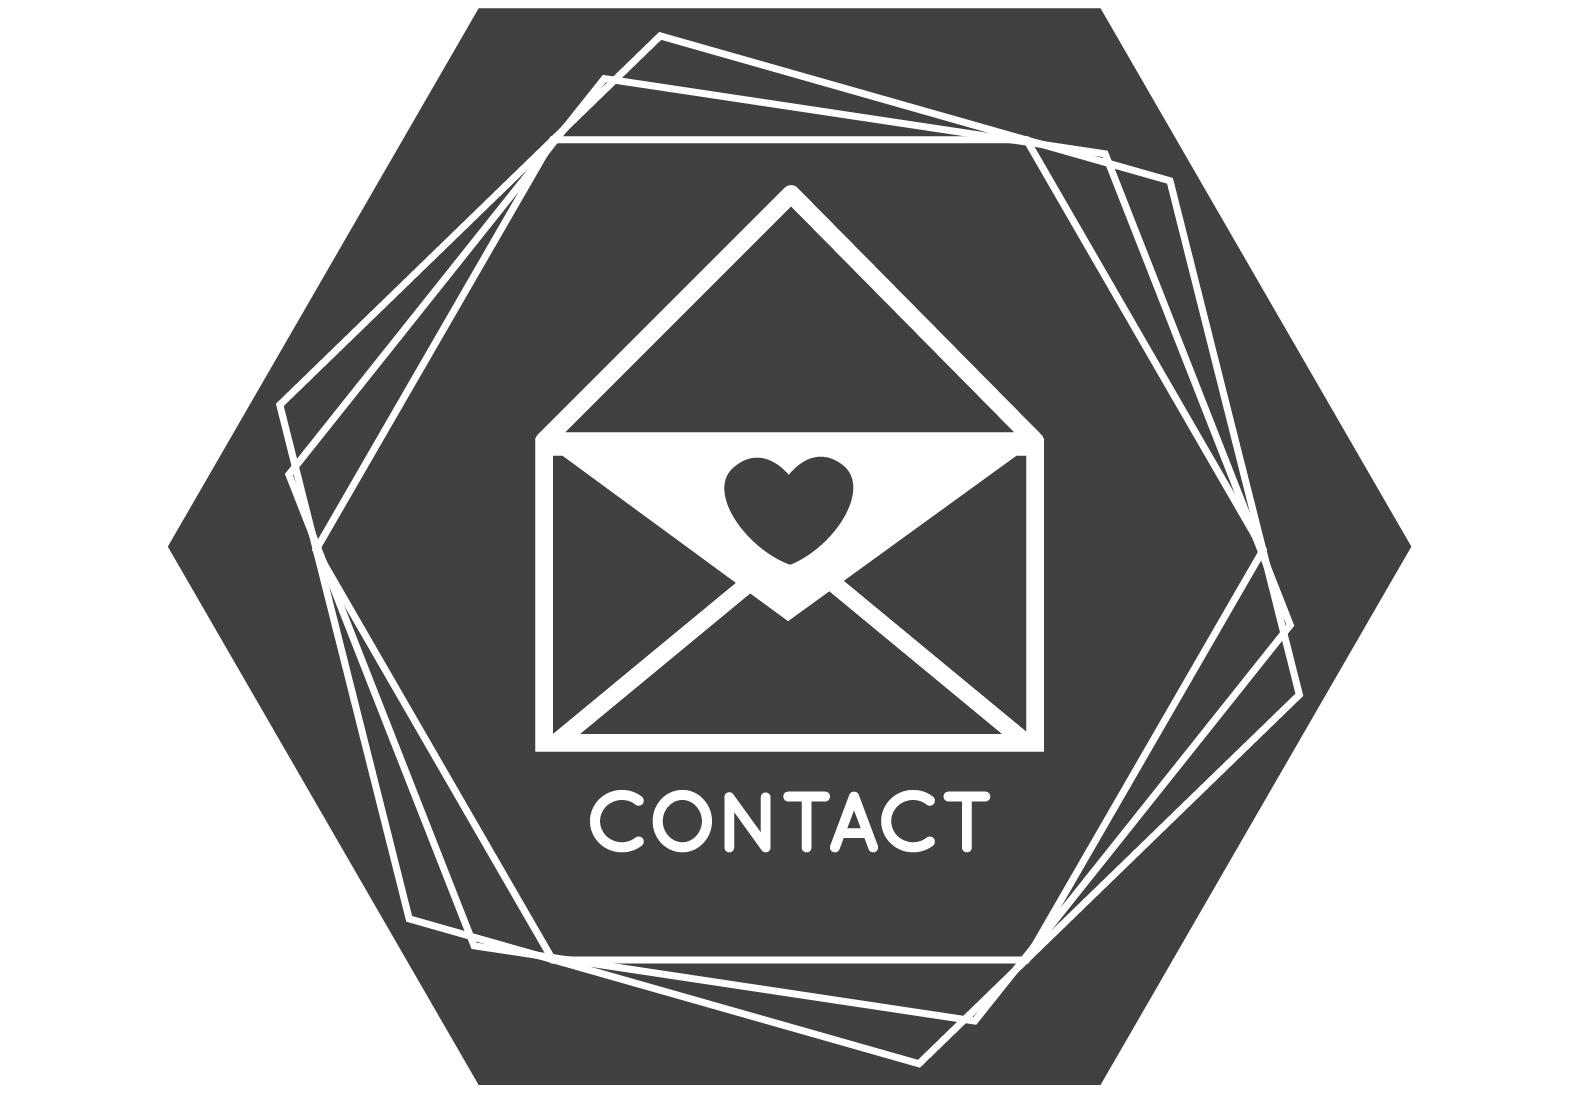 Symbol 1 Contact-01-01.jpg